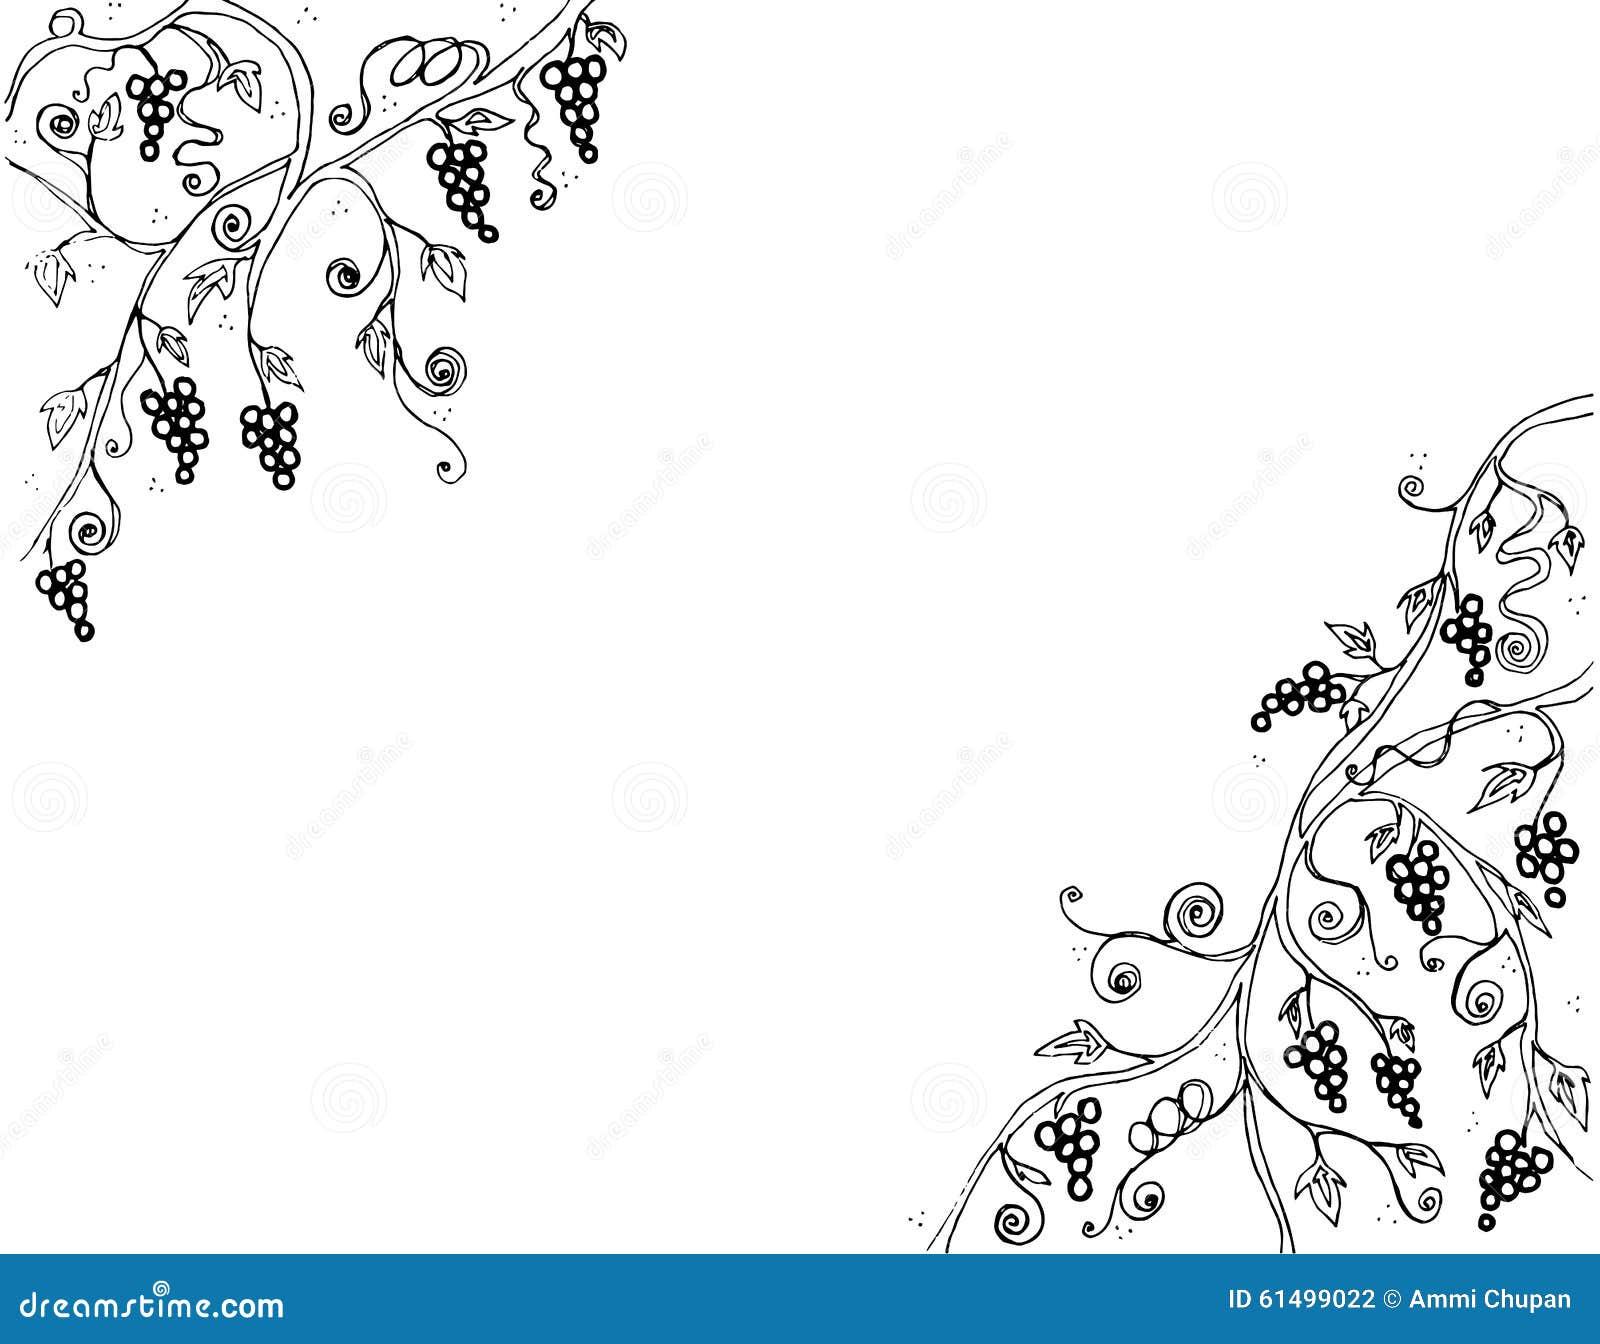 Grape Vine And Branch Illustration Line Art Black And White ... for Drawing Grape Vines  165jwn